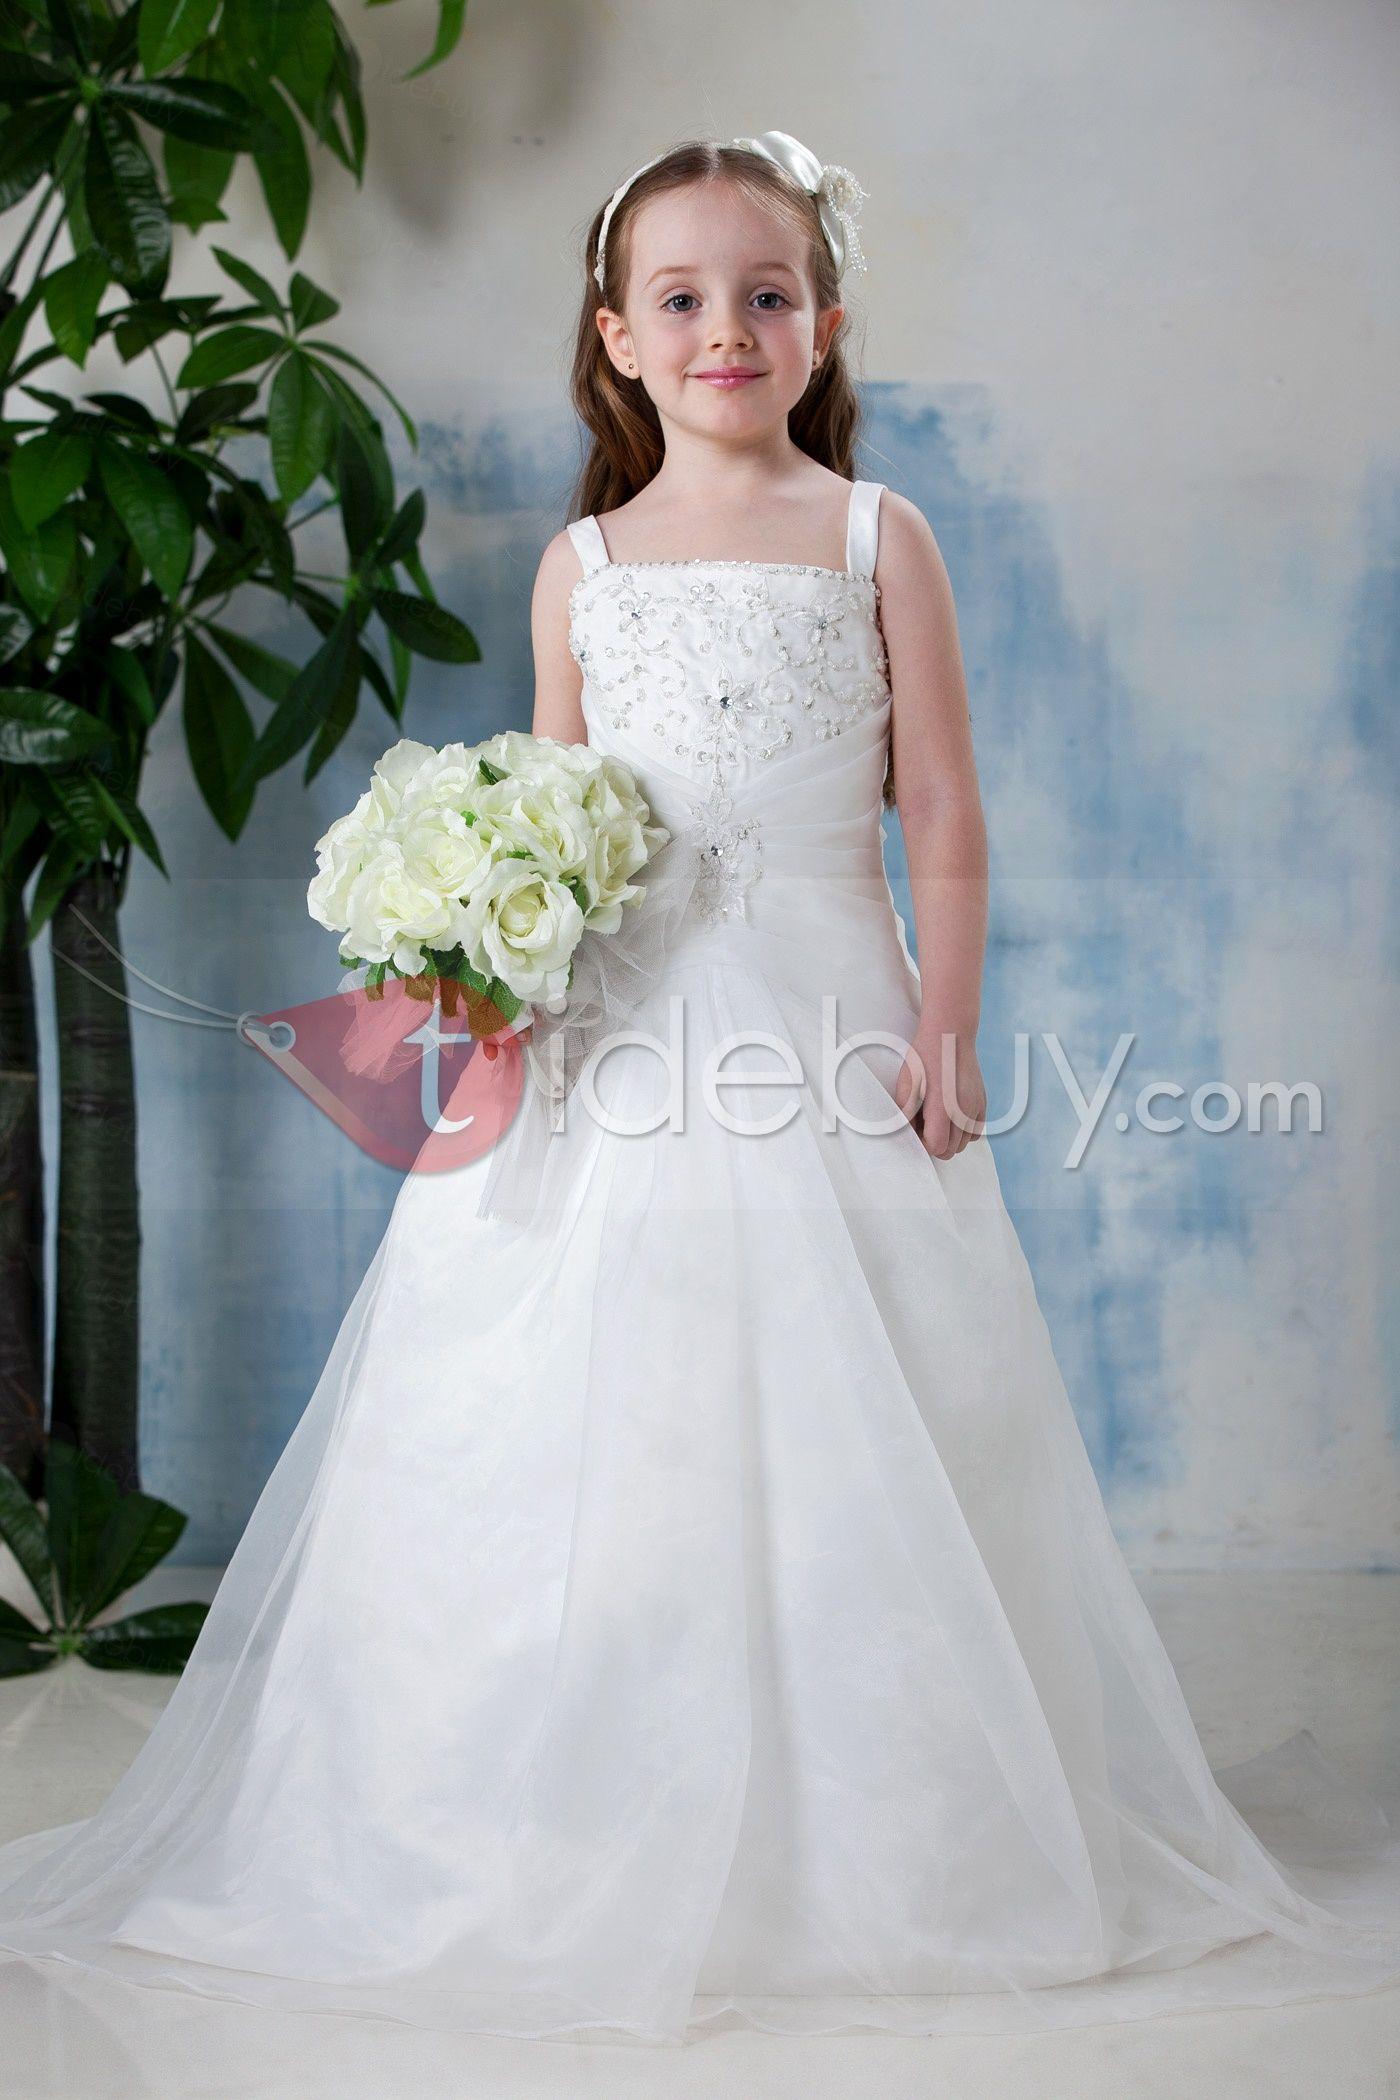 0ccf45164 A-Line Square Neckline Floor- Length Flower Girl Dress : Tidebuy.com